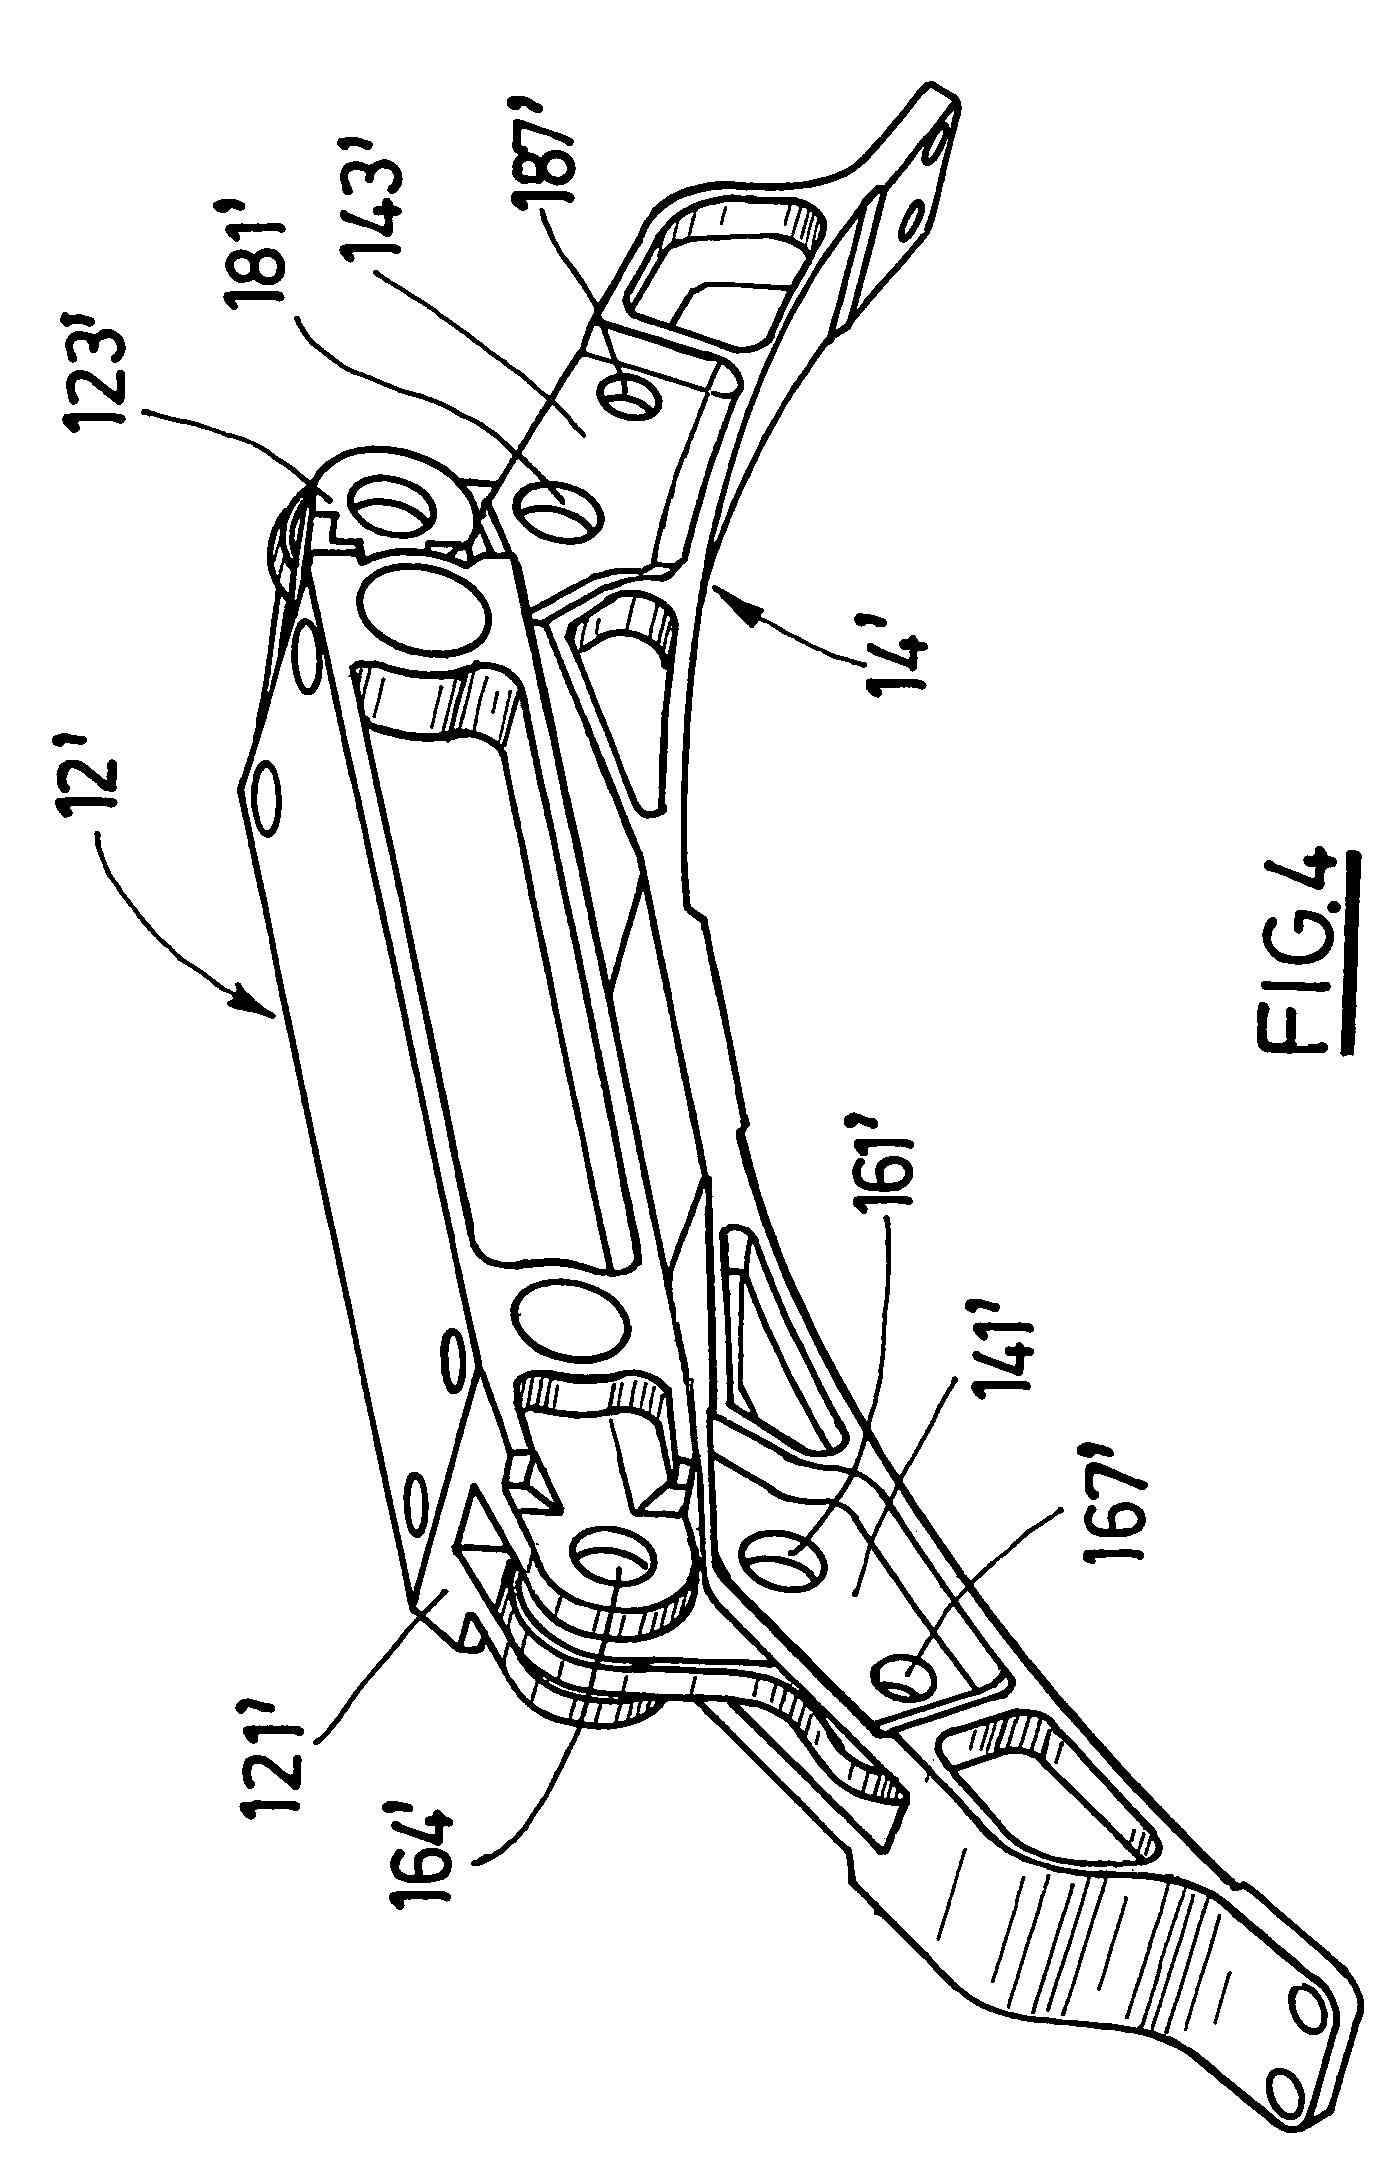 Patent us7021585 aircraft engine rear 01 saab 9 5 wiring diagram us07165743 20070123 d00004 patent us7021585